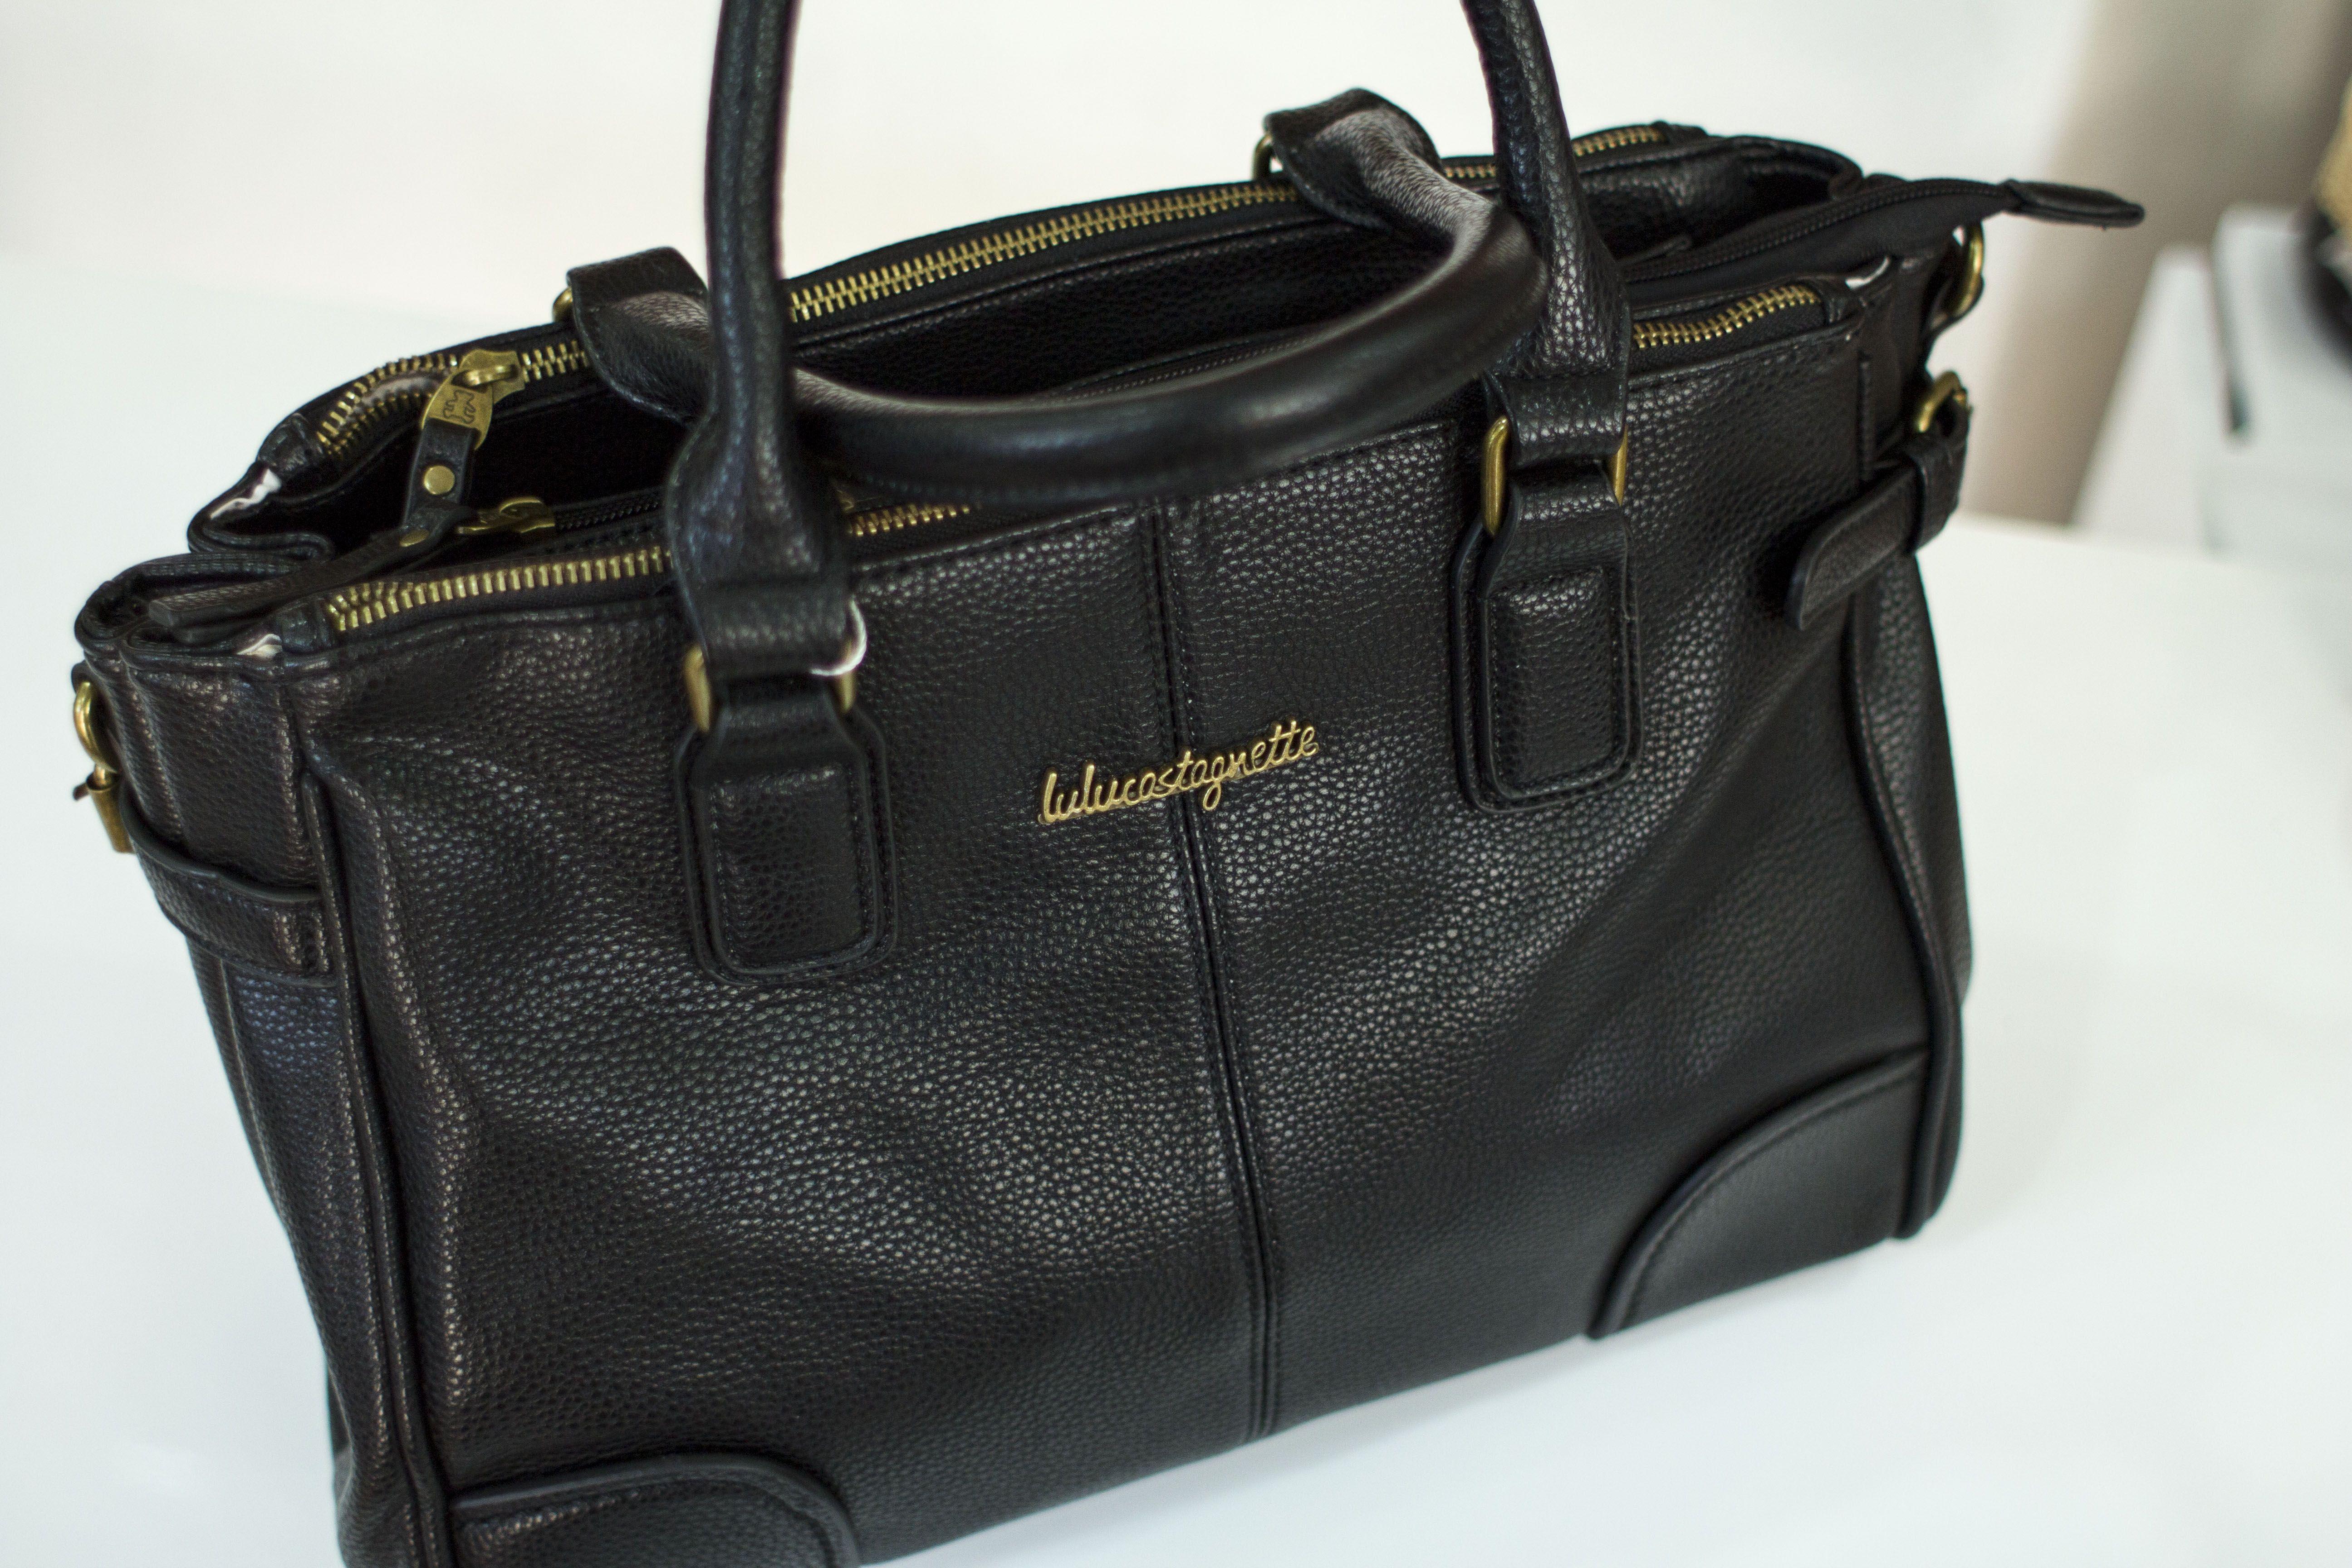 b11dbbab5aeb Sac Lulu Castagnette   cuir noir     ACCESSOIRES     Cuir noir, Cuir ...